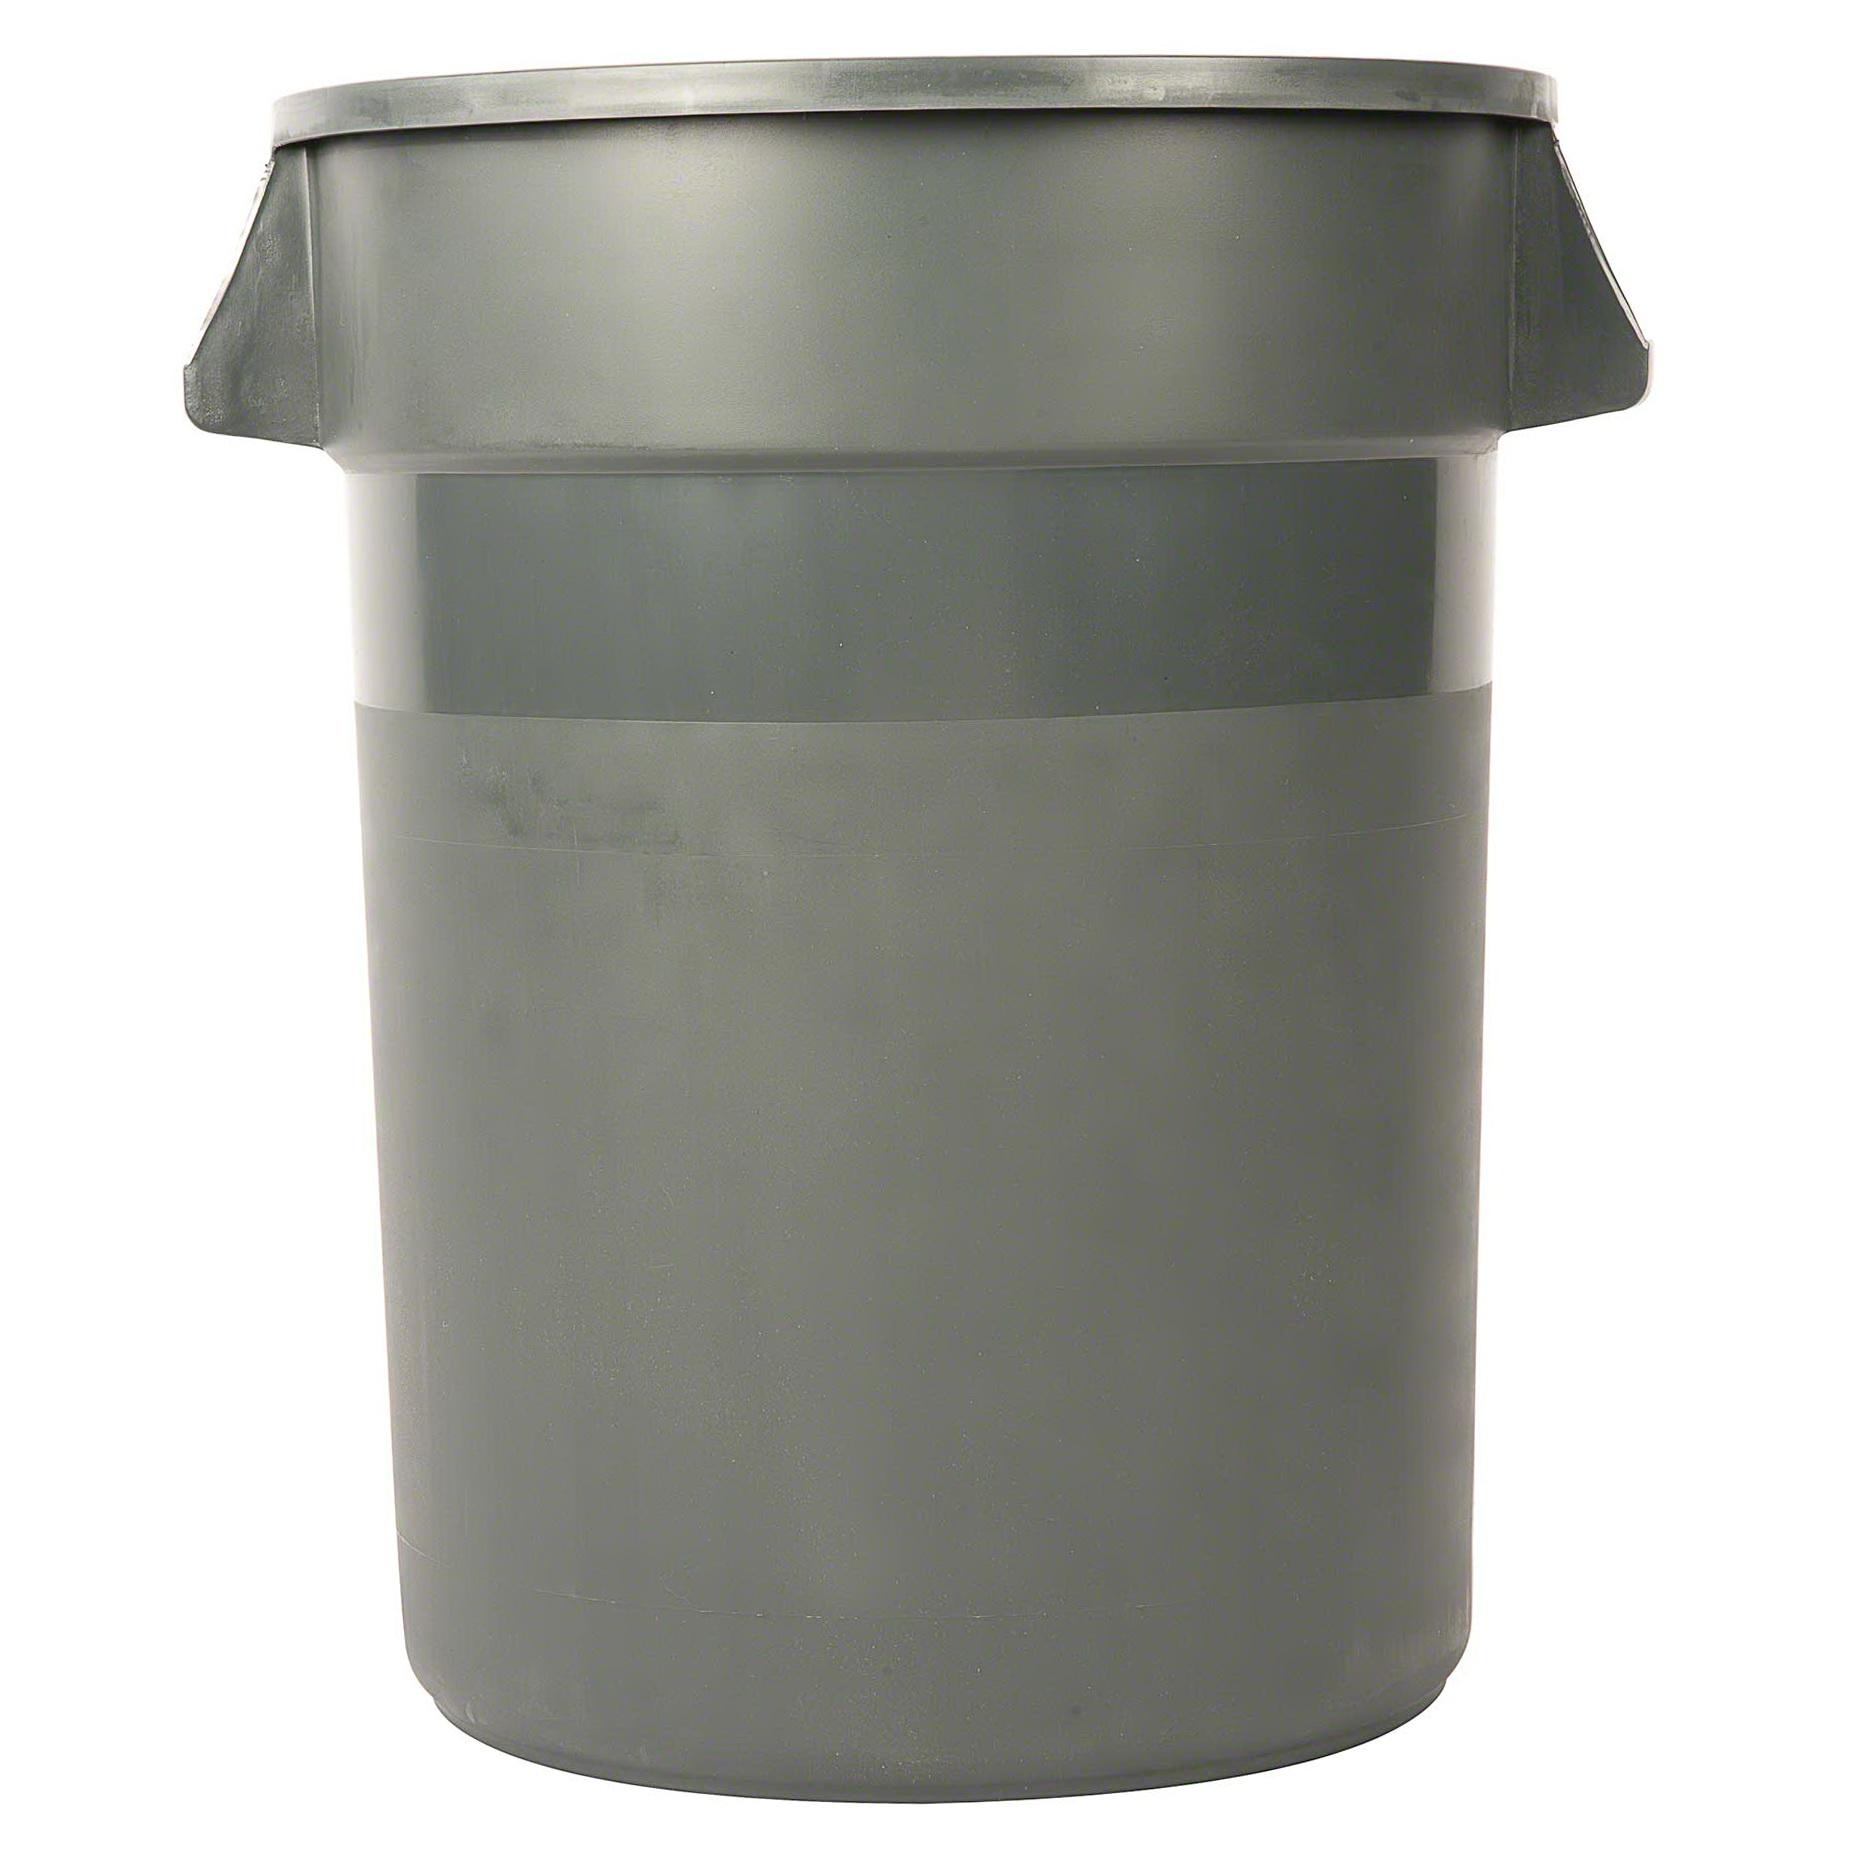 Plastic Kitchen Trash Cans